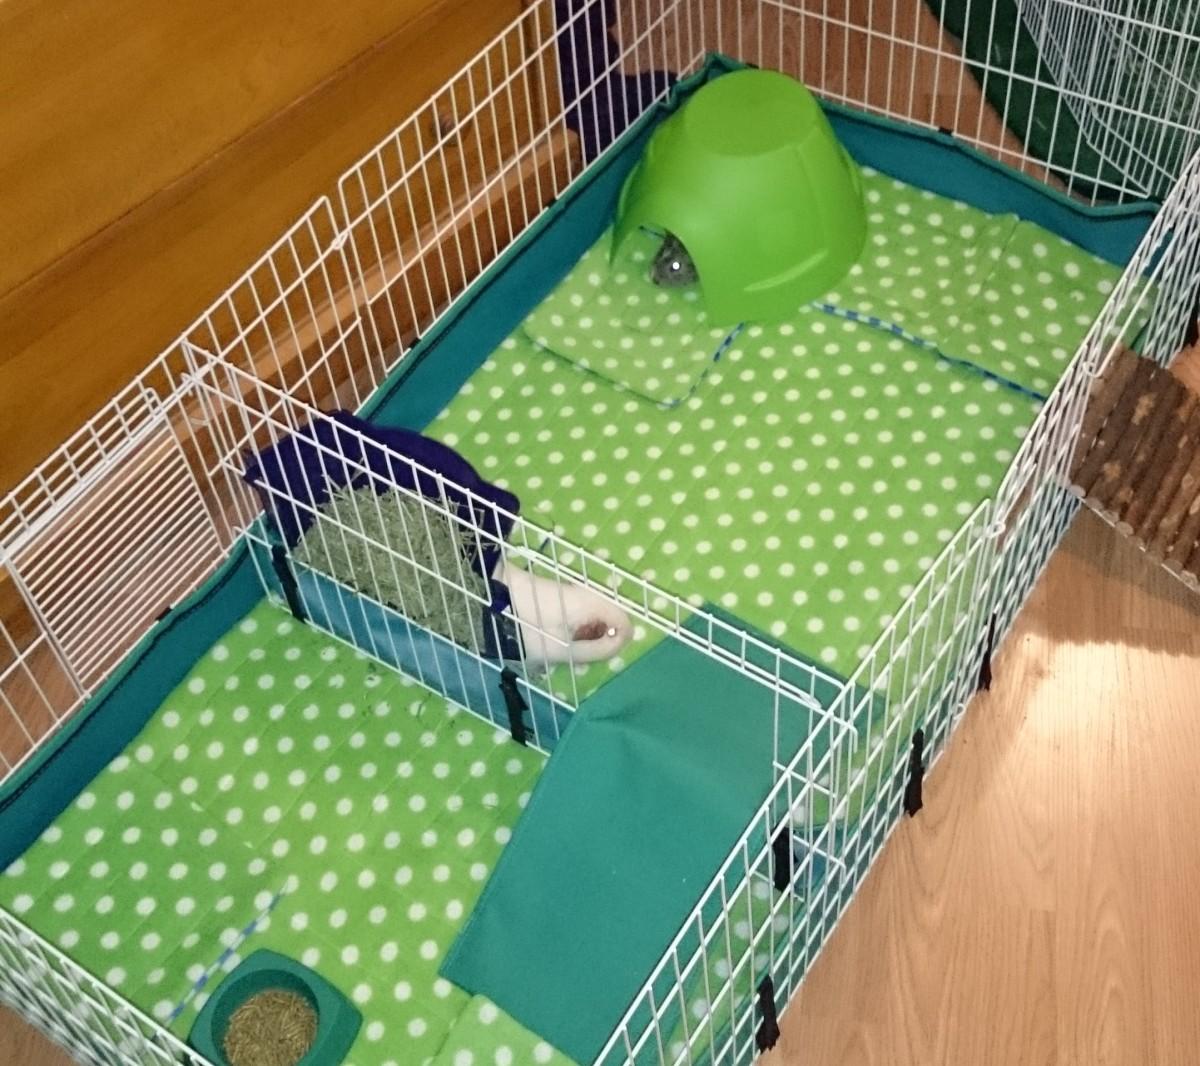 Fleece-lined guinea pig cage.